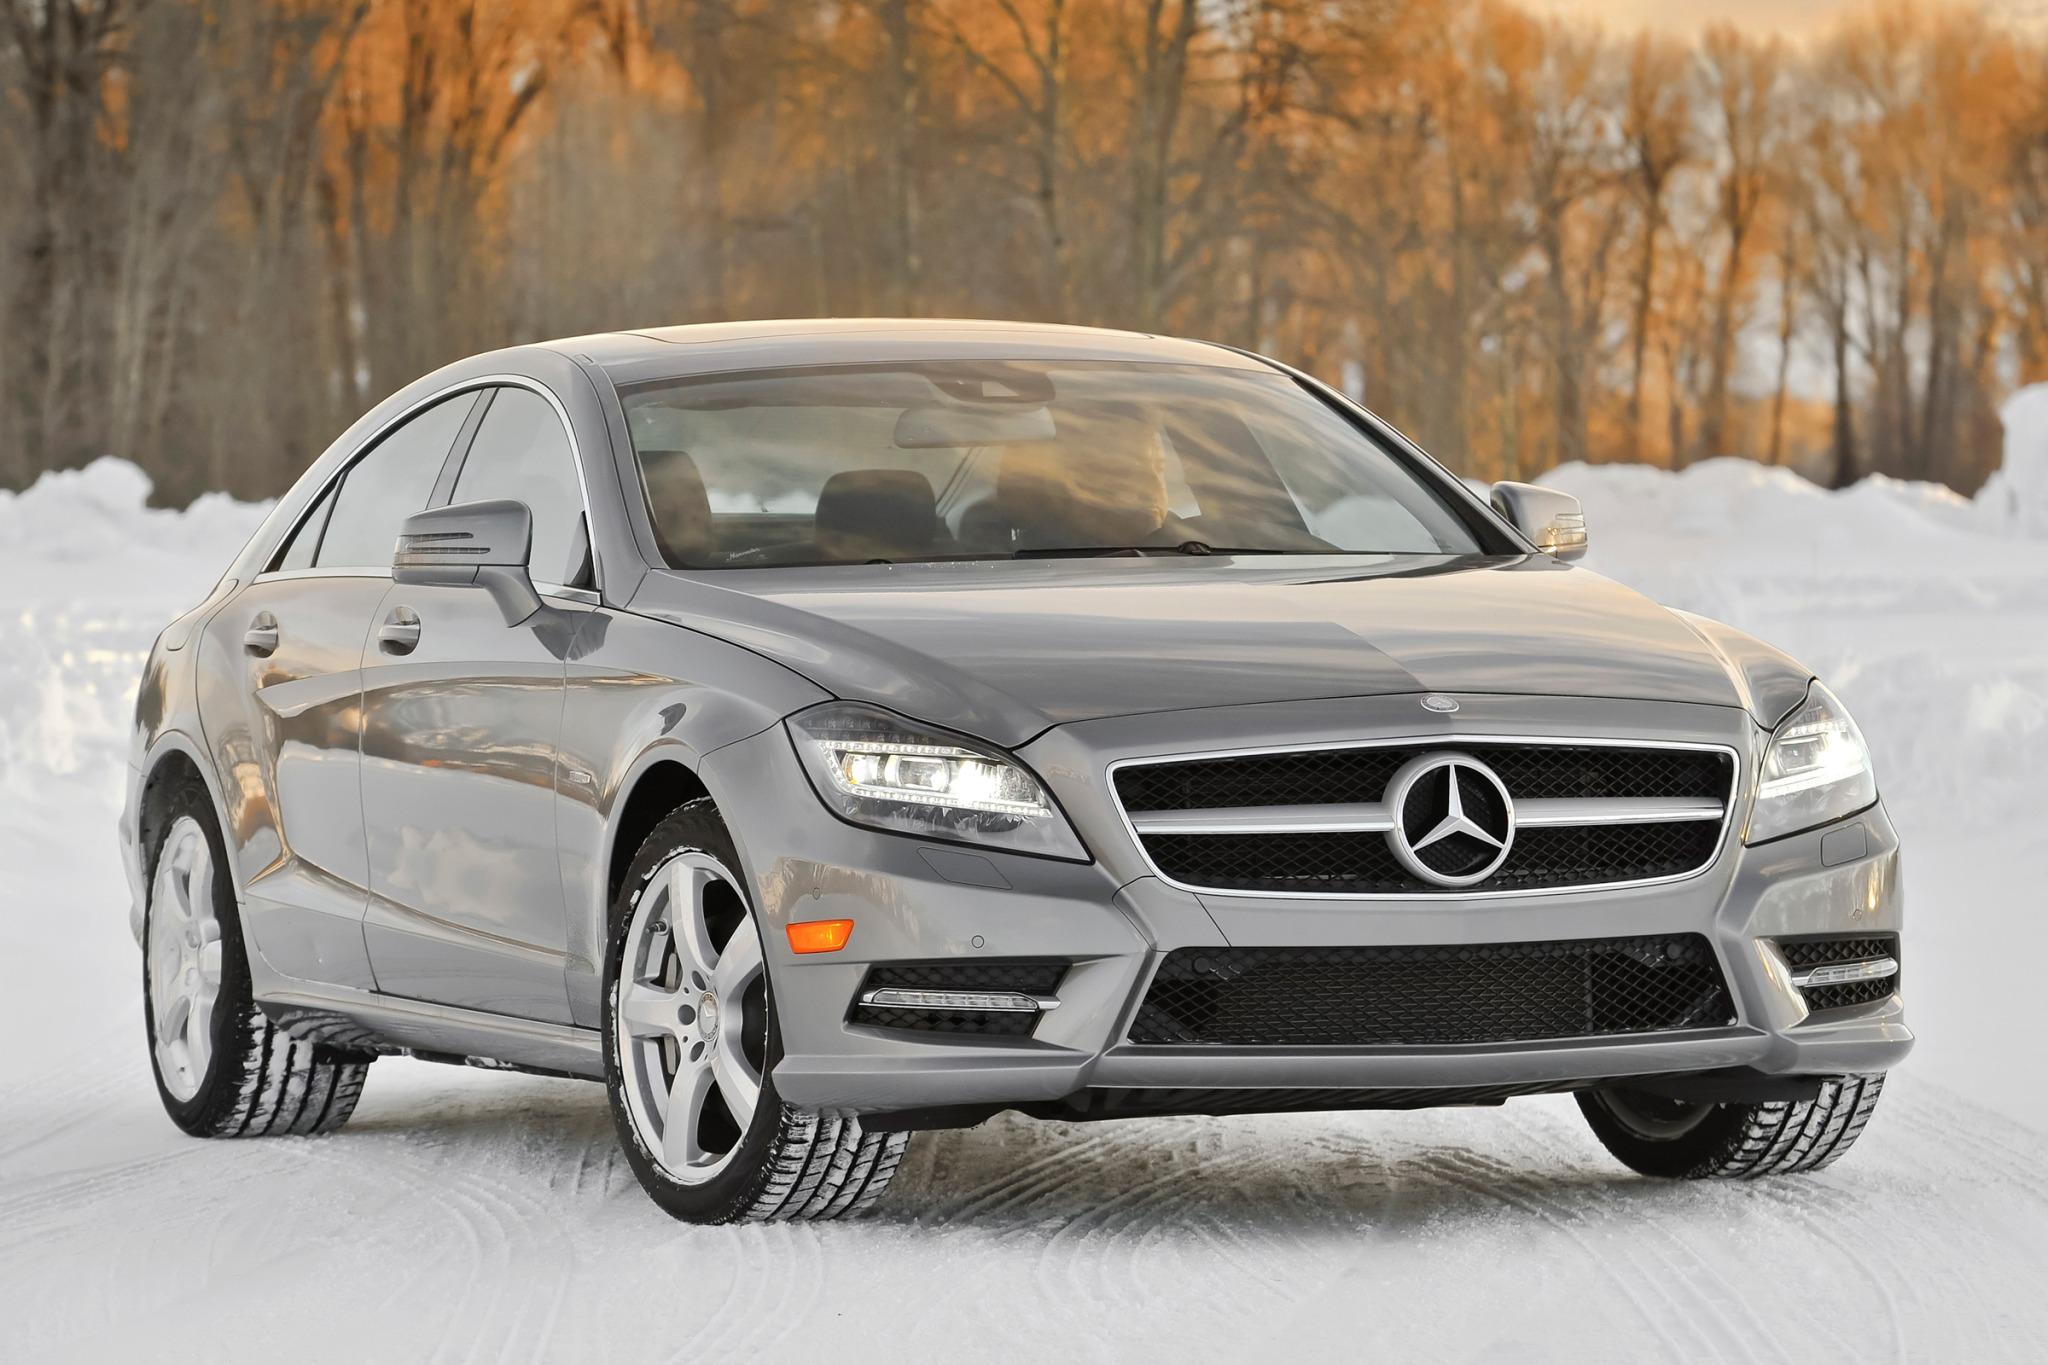 Mercedes Benz 4matic >> 2014 MERCEDES-BENZ CLS-CLASS - Image #7